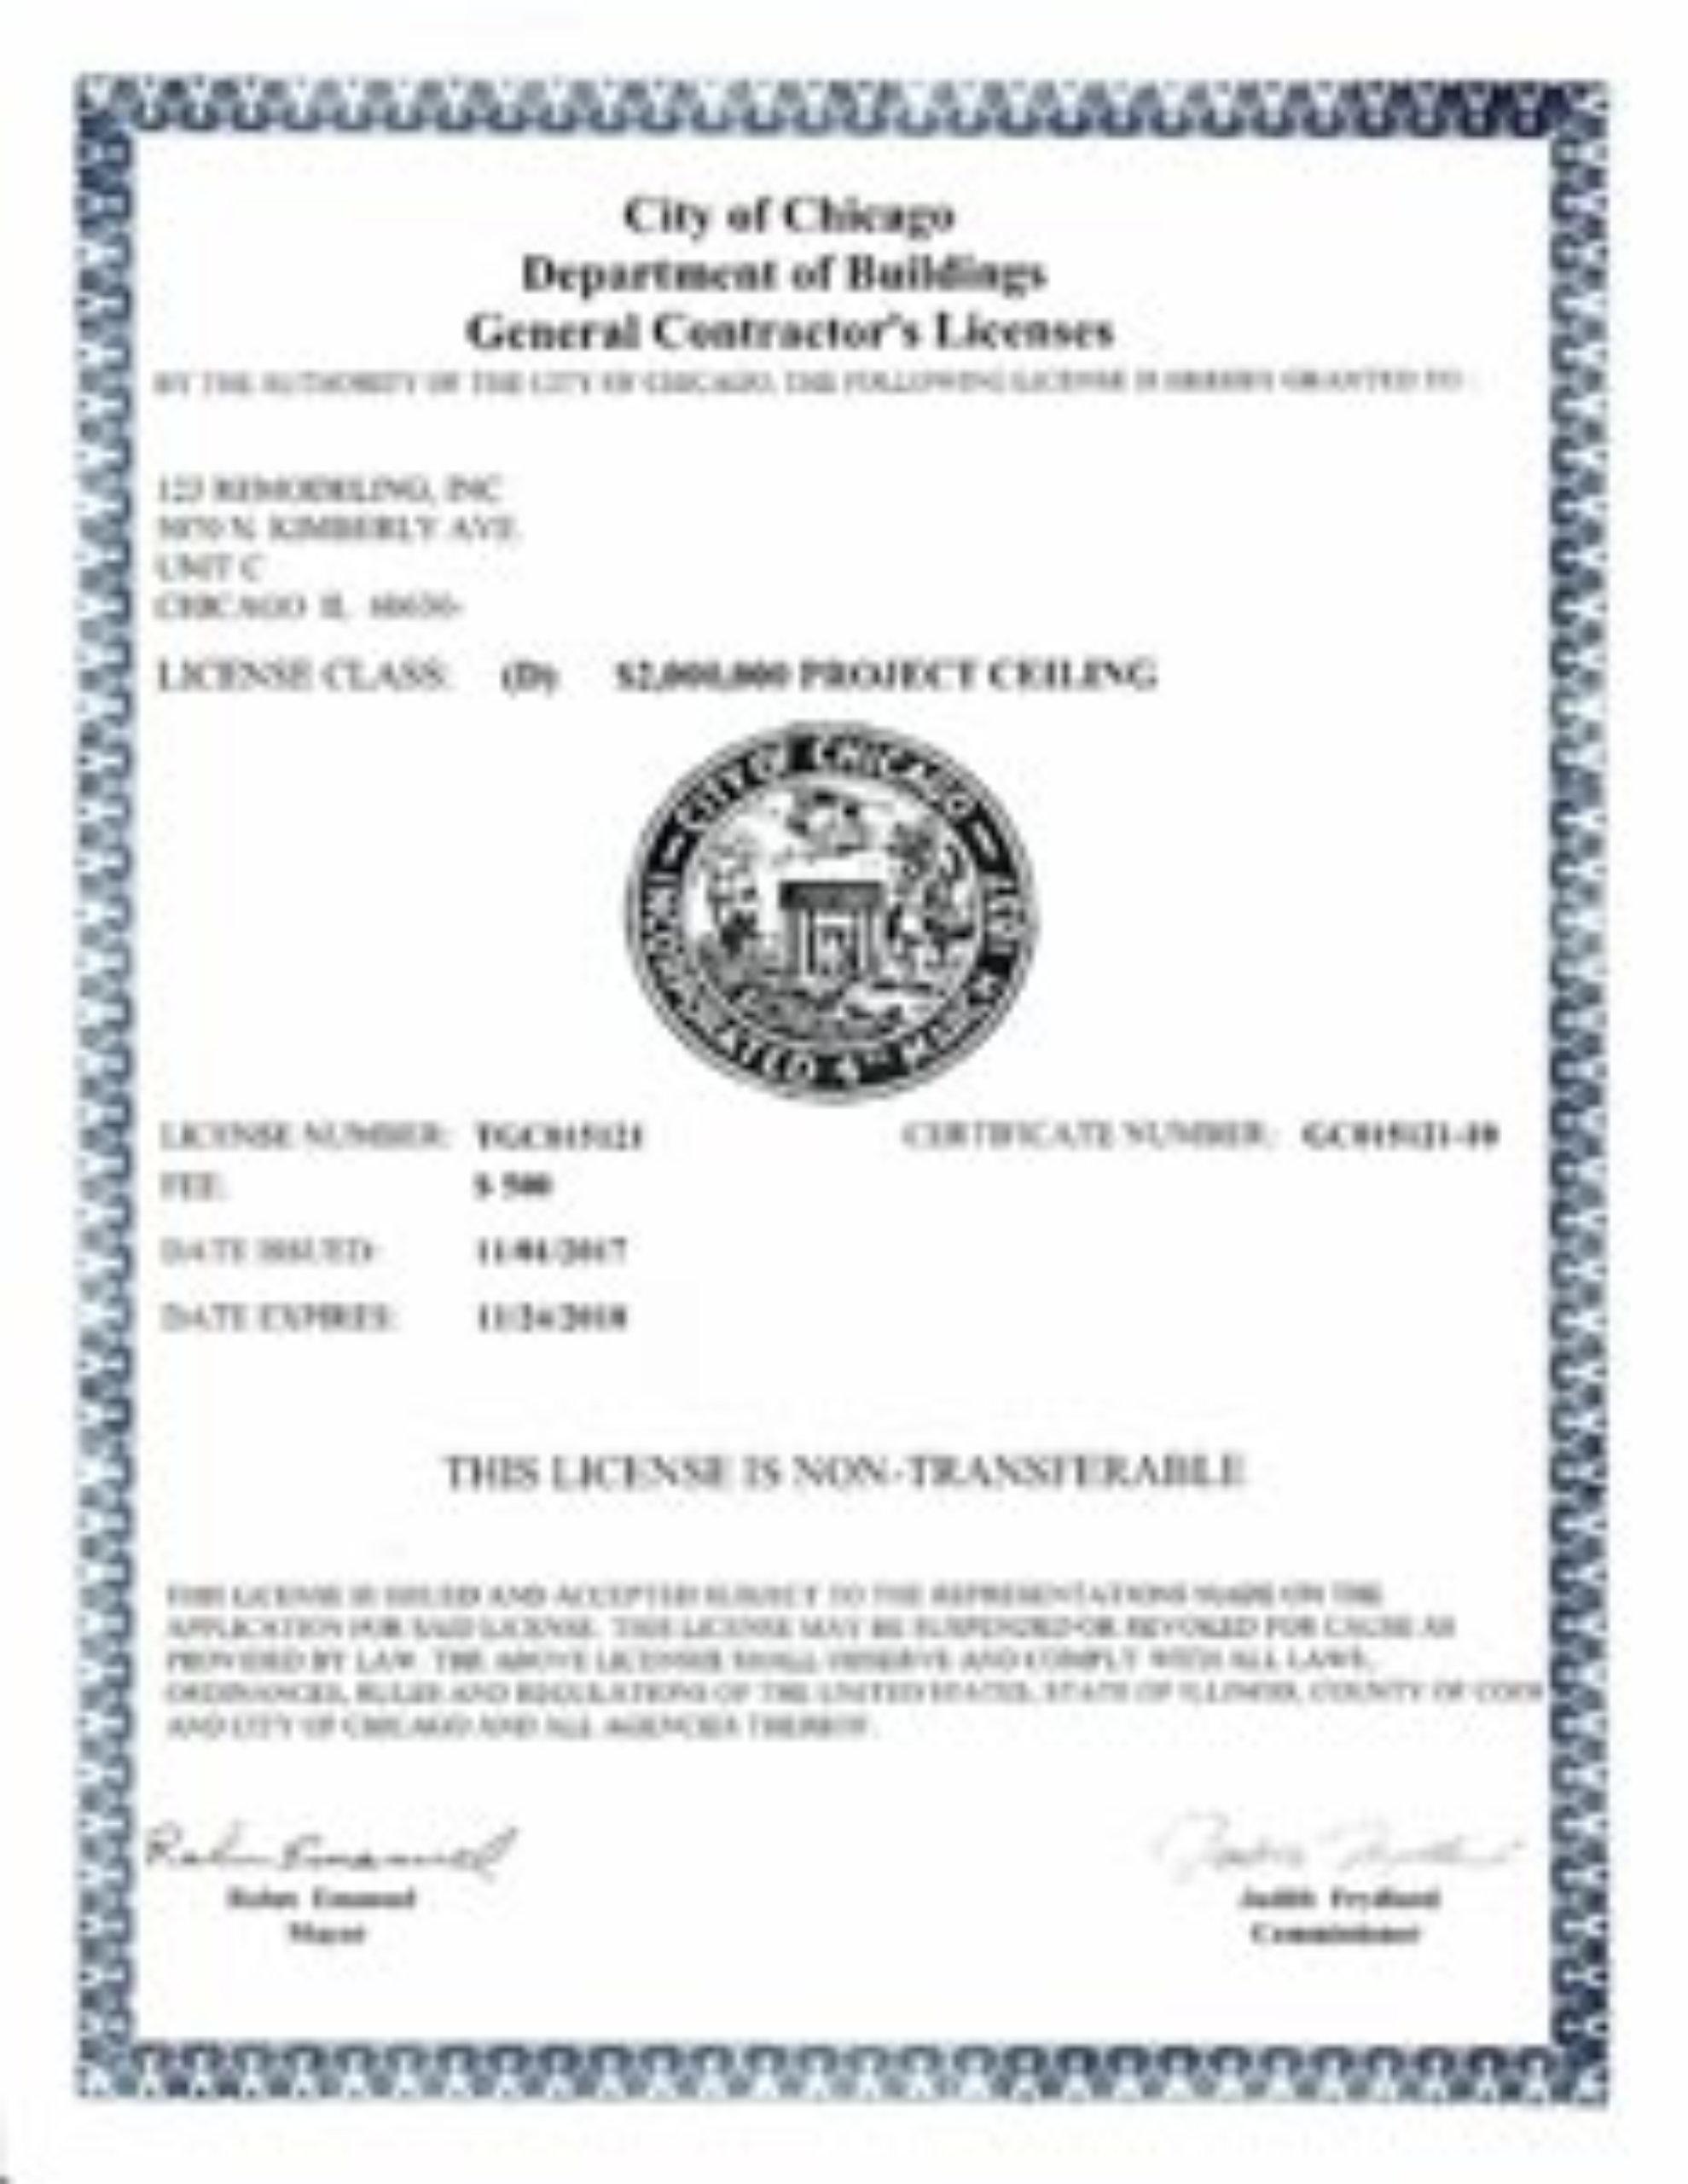 General Contractor License 2017-2018